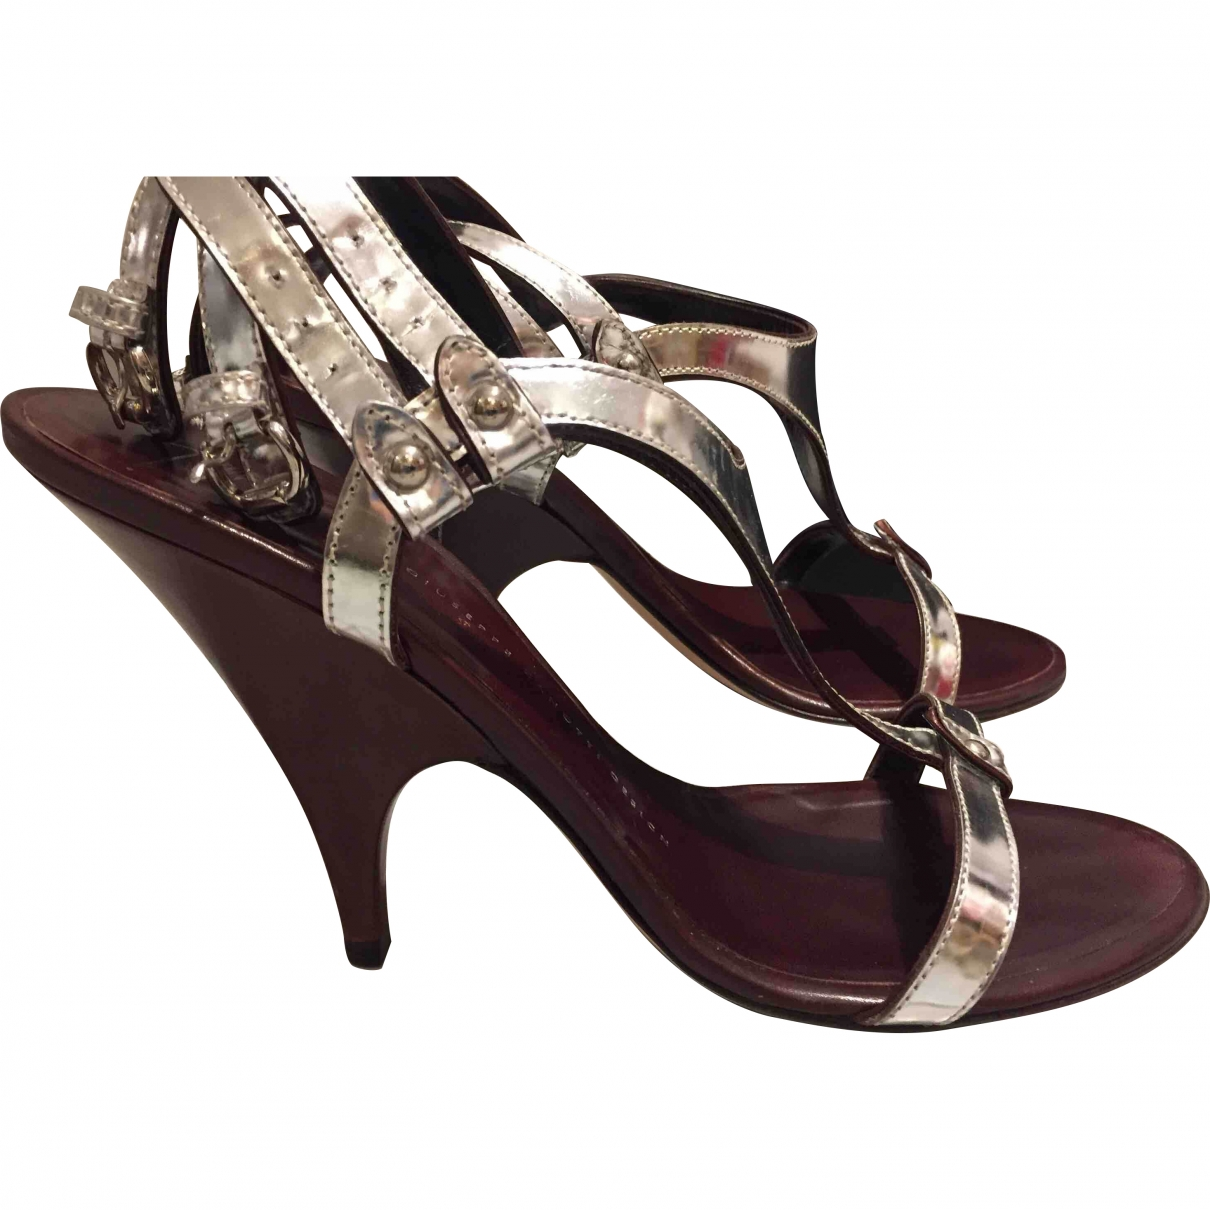 Giuseppe Zanotti \N Silver Leather Sandals for Women 39.5 EU